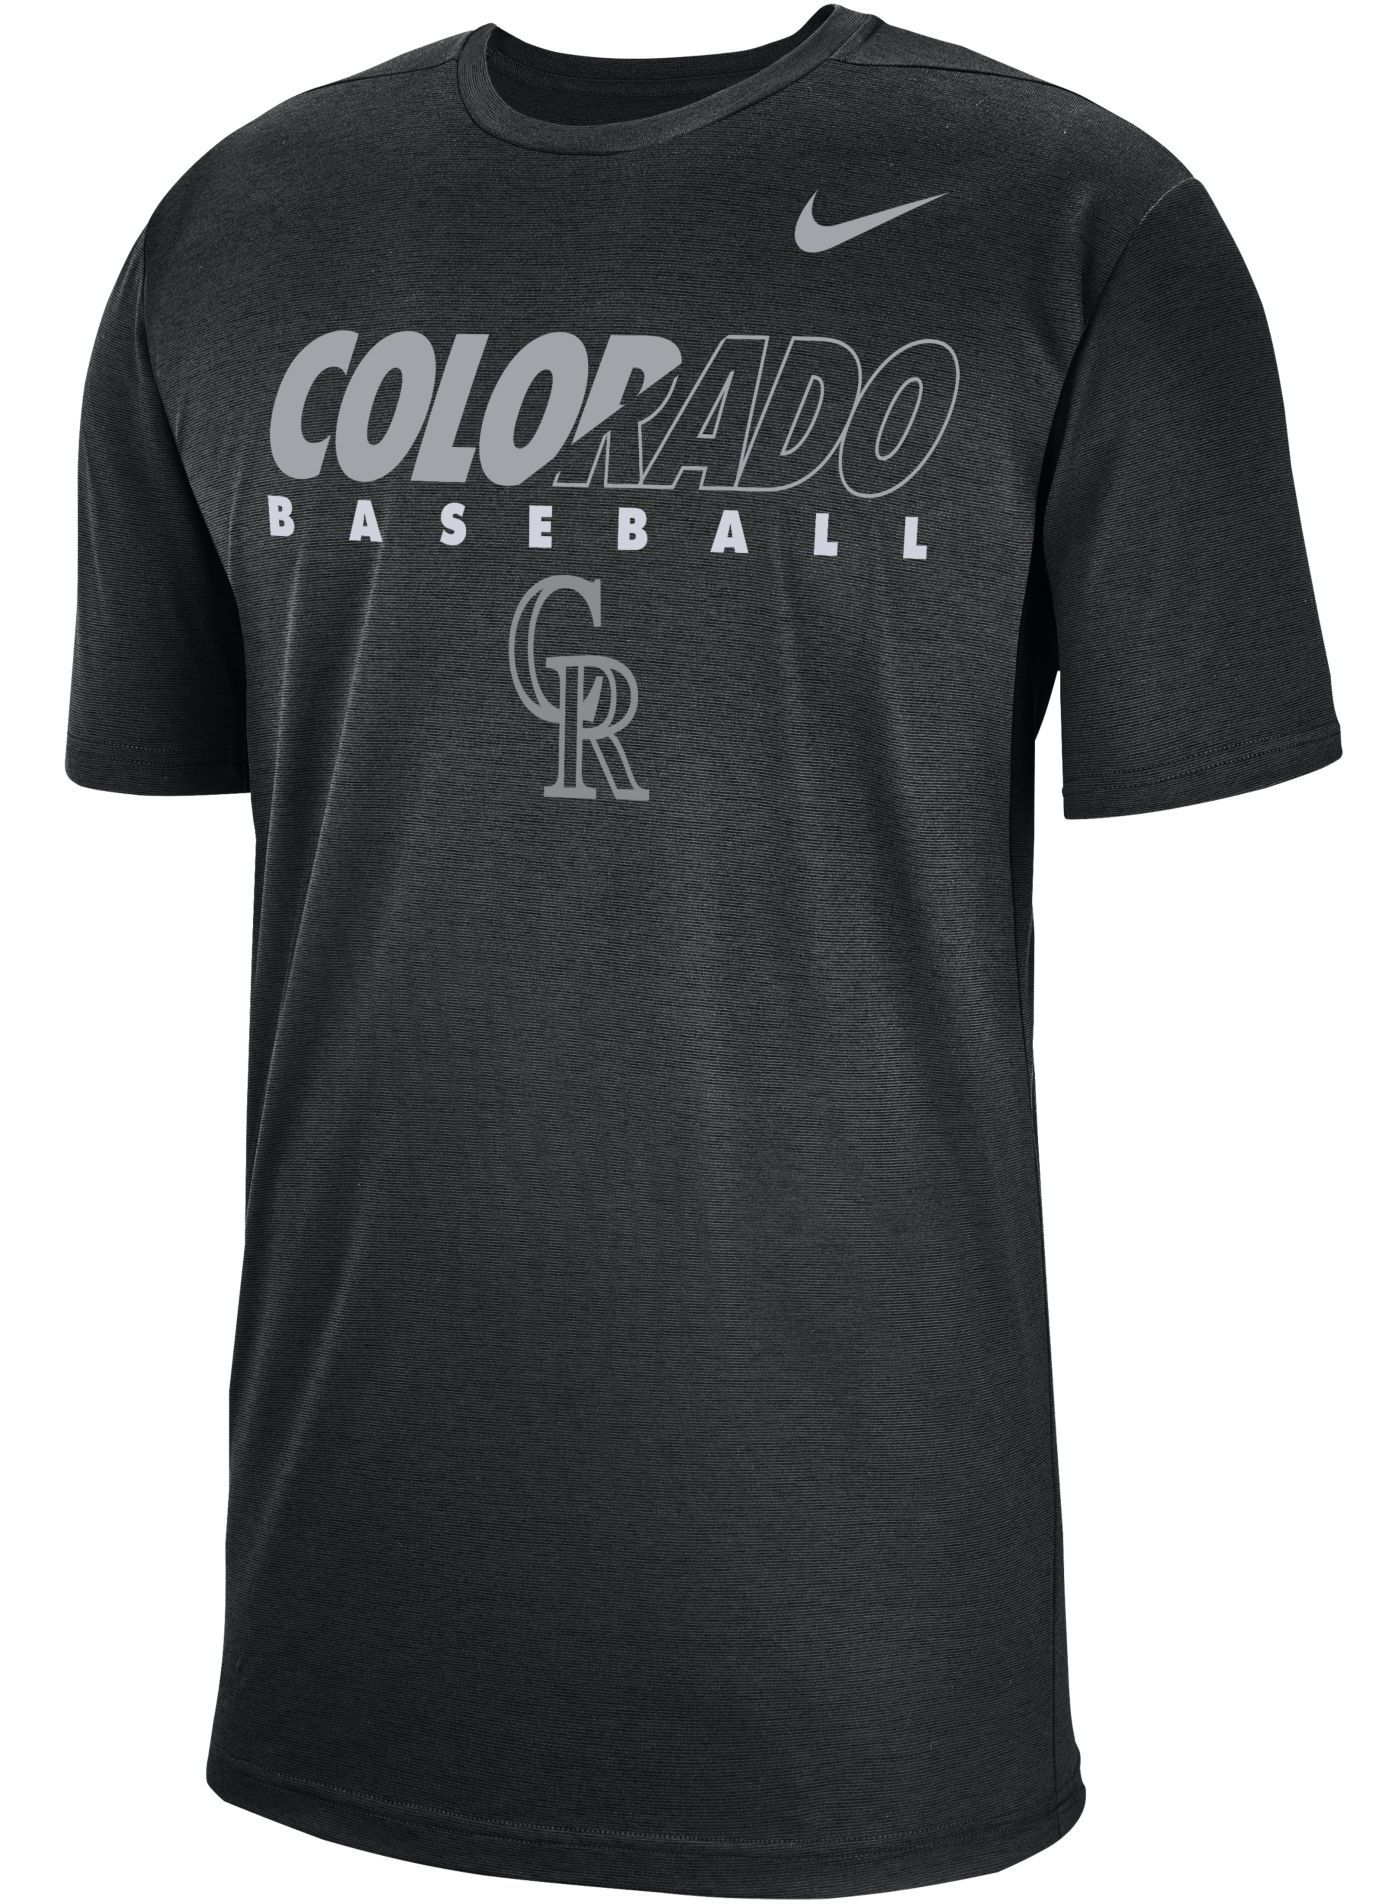 Nike Men's Colorado Rockies Dri-FIT Breathe T-Shirt